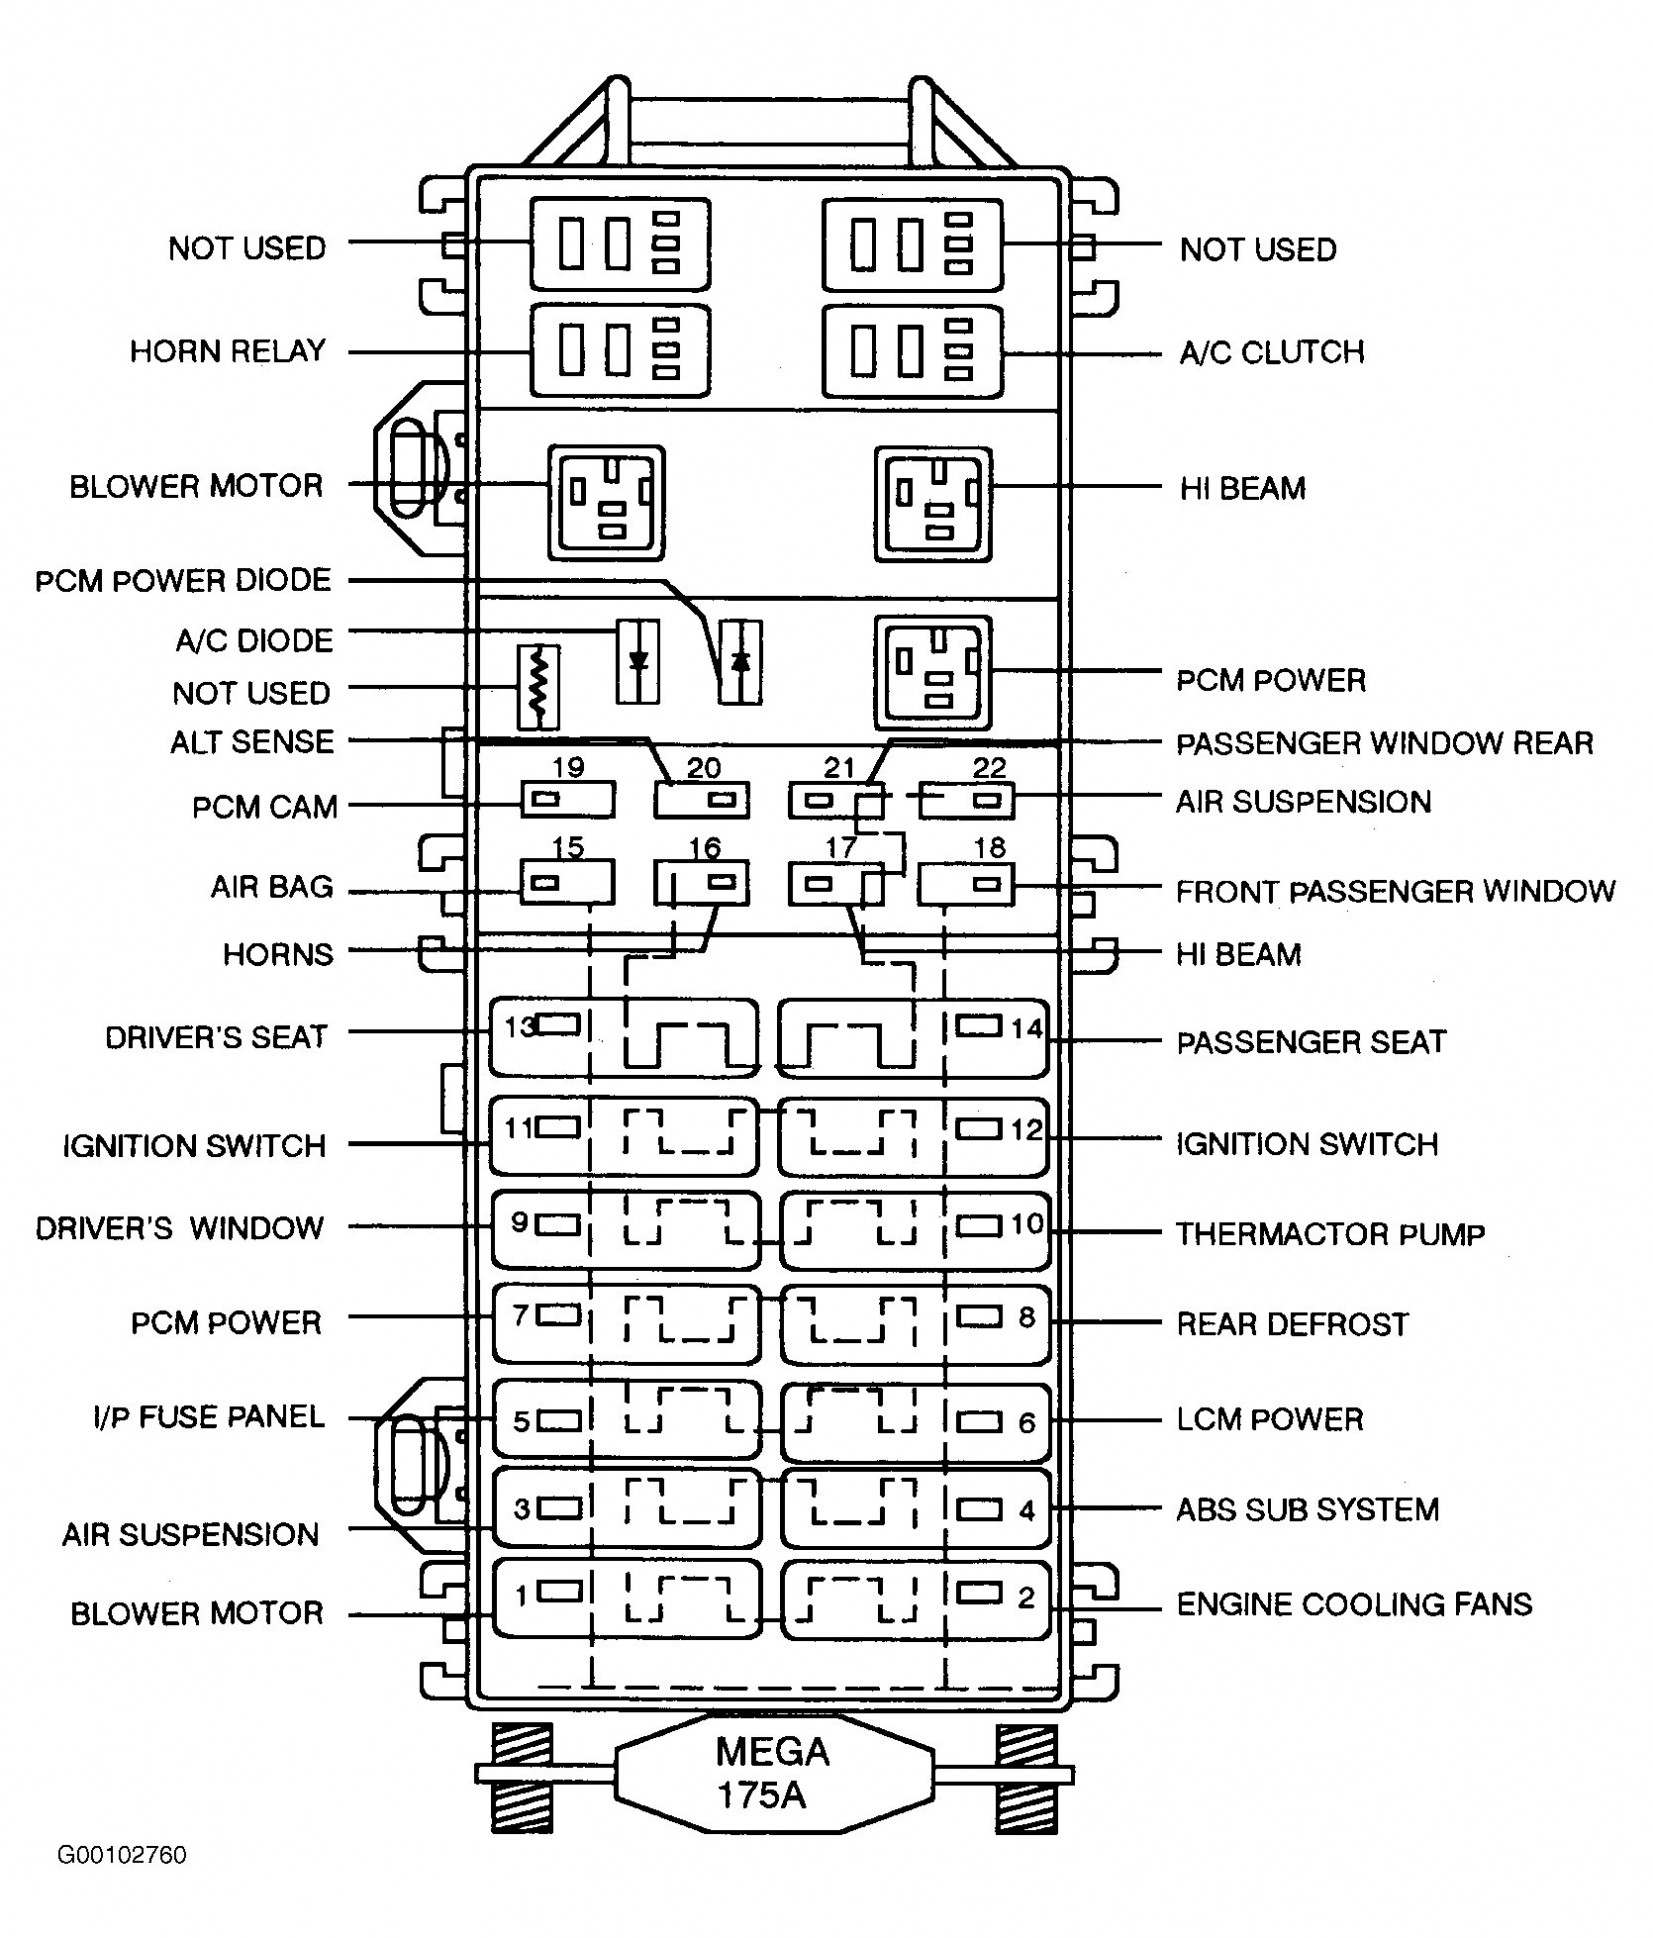 2001 Lincoln town Car Fuse Box Diagram 2001 Lincoln town Car Fuse Box Diagram — Daytonva150 Of 2001 Lincoln town Car Fuse Box Diagram